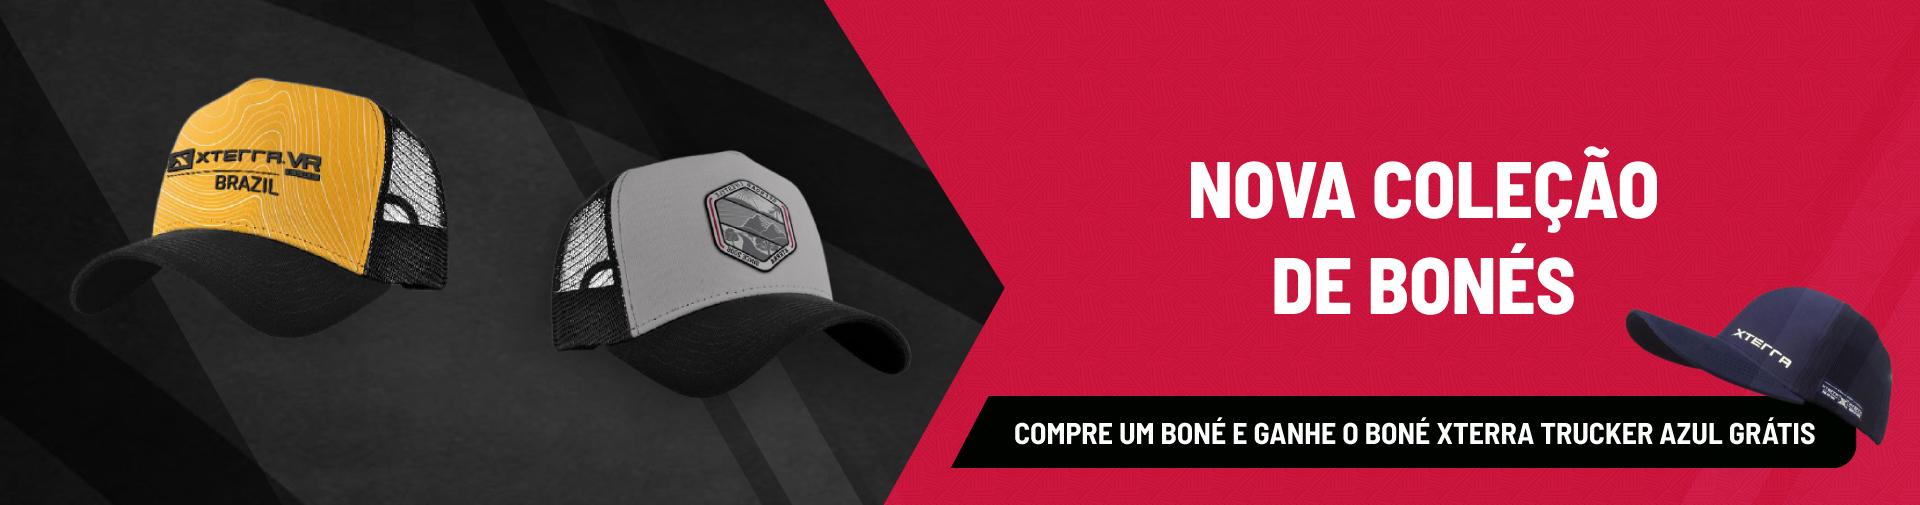 Banner_compre_1_bone_leve_2